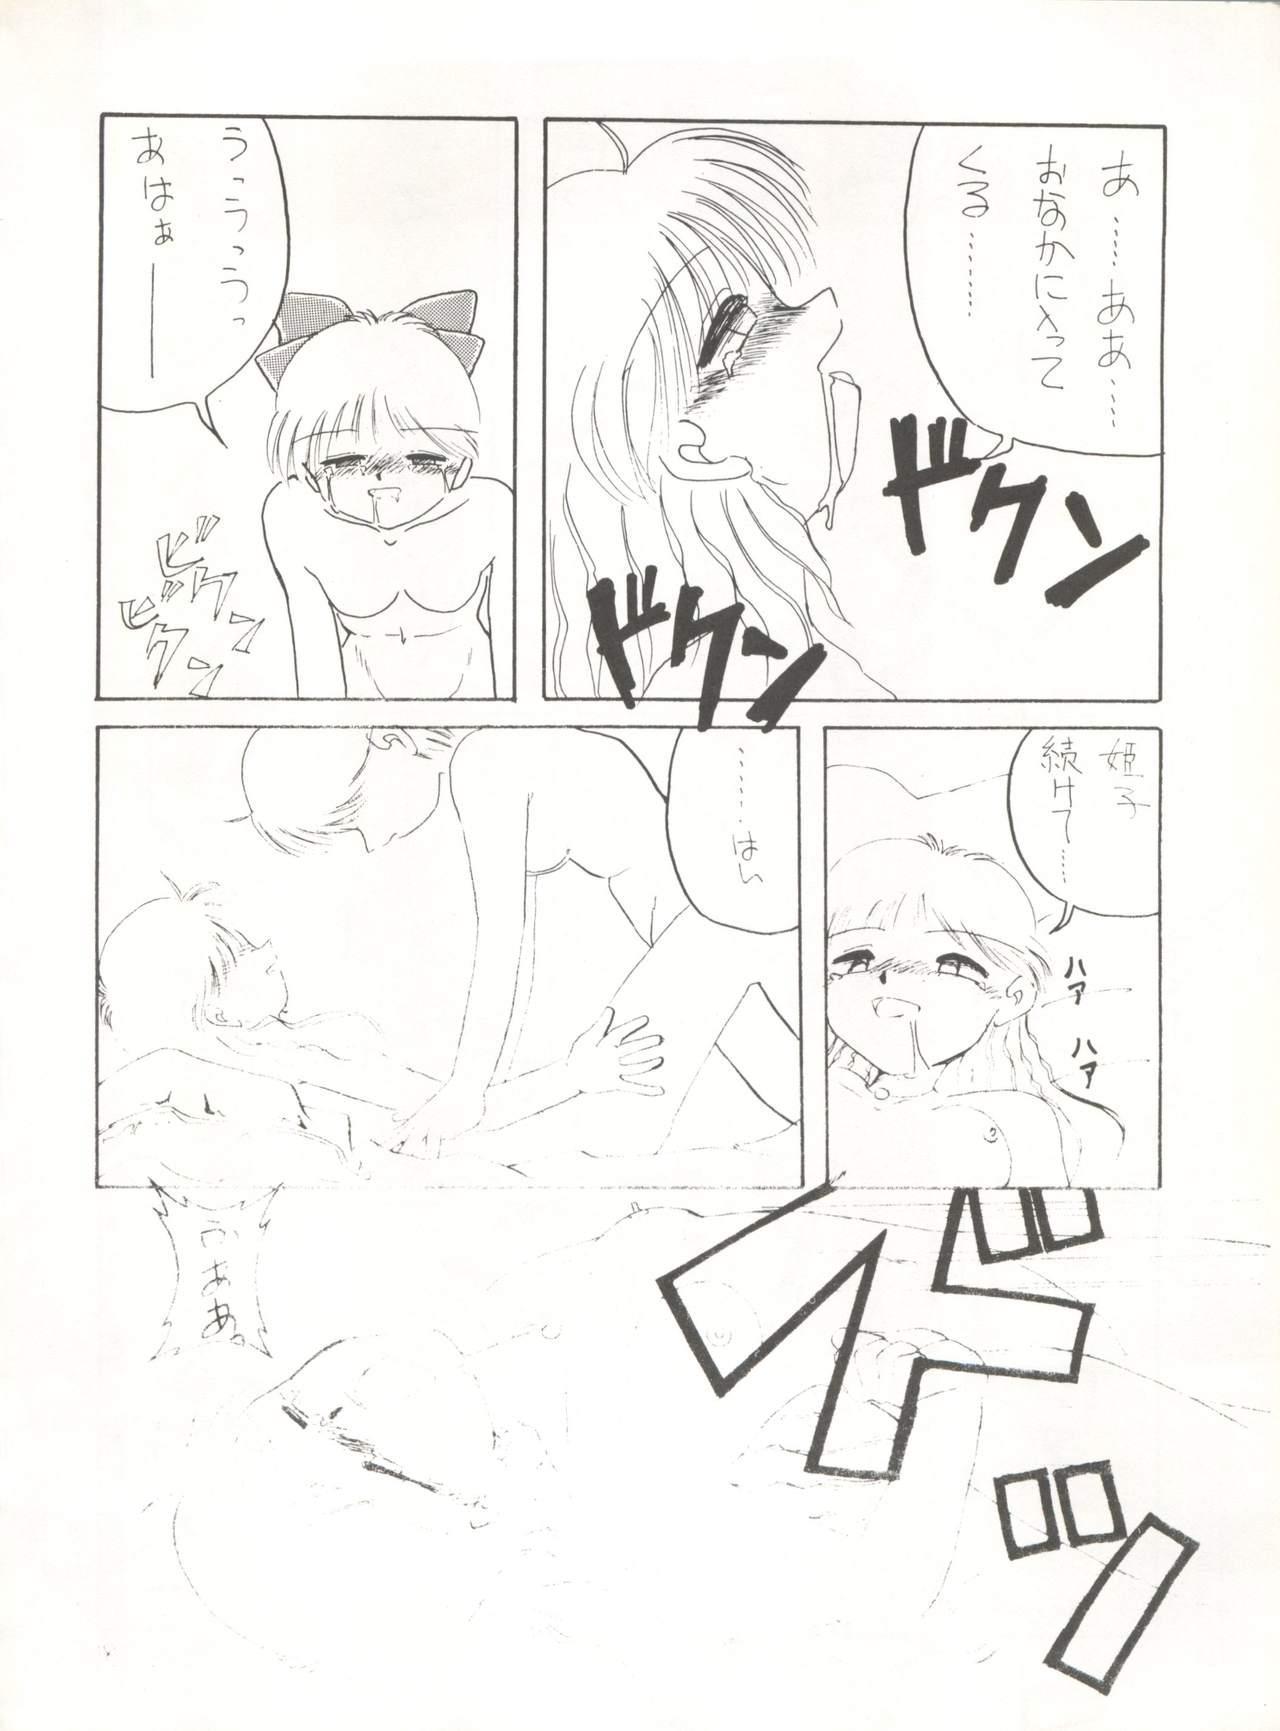 [Global One (MARO)] Sadistic 5 (Cutey Honey, Devilman, Sailor Moon), [Global One (MARO)] Sadistic (Dirty Pair, Fushigi no Umi no Nadia, Sailor Moon), [Studio Ikkatsumajin] .ribbon (Hime-chan's Ribbon) 141